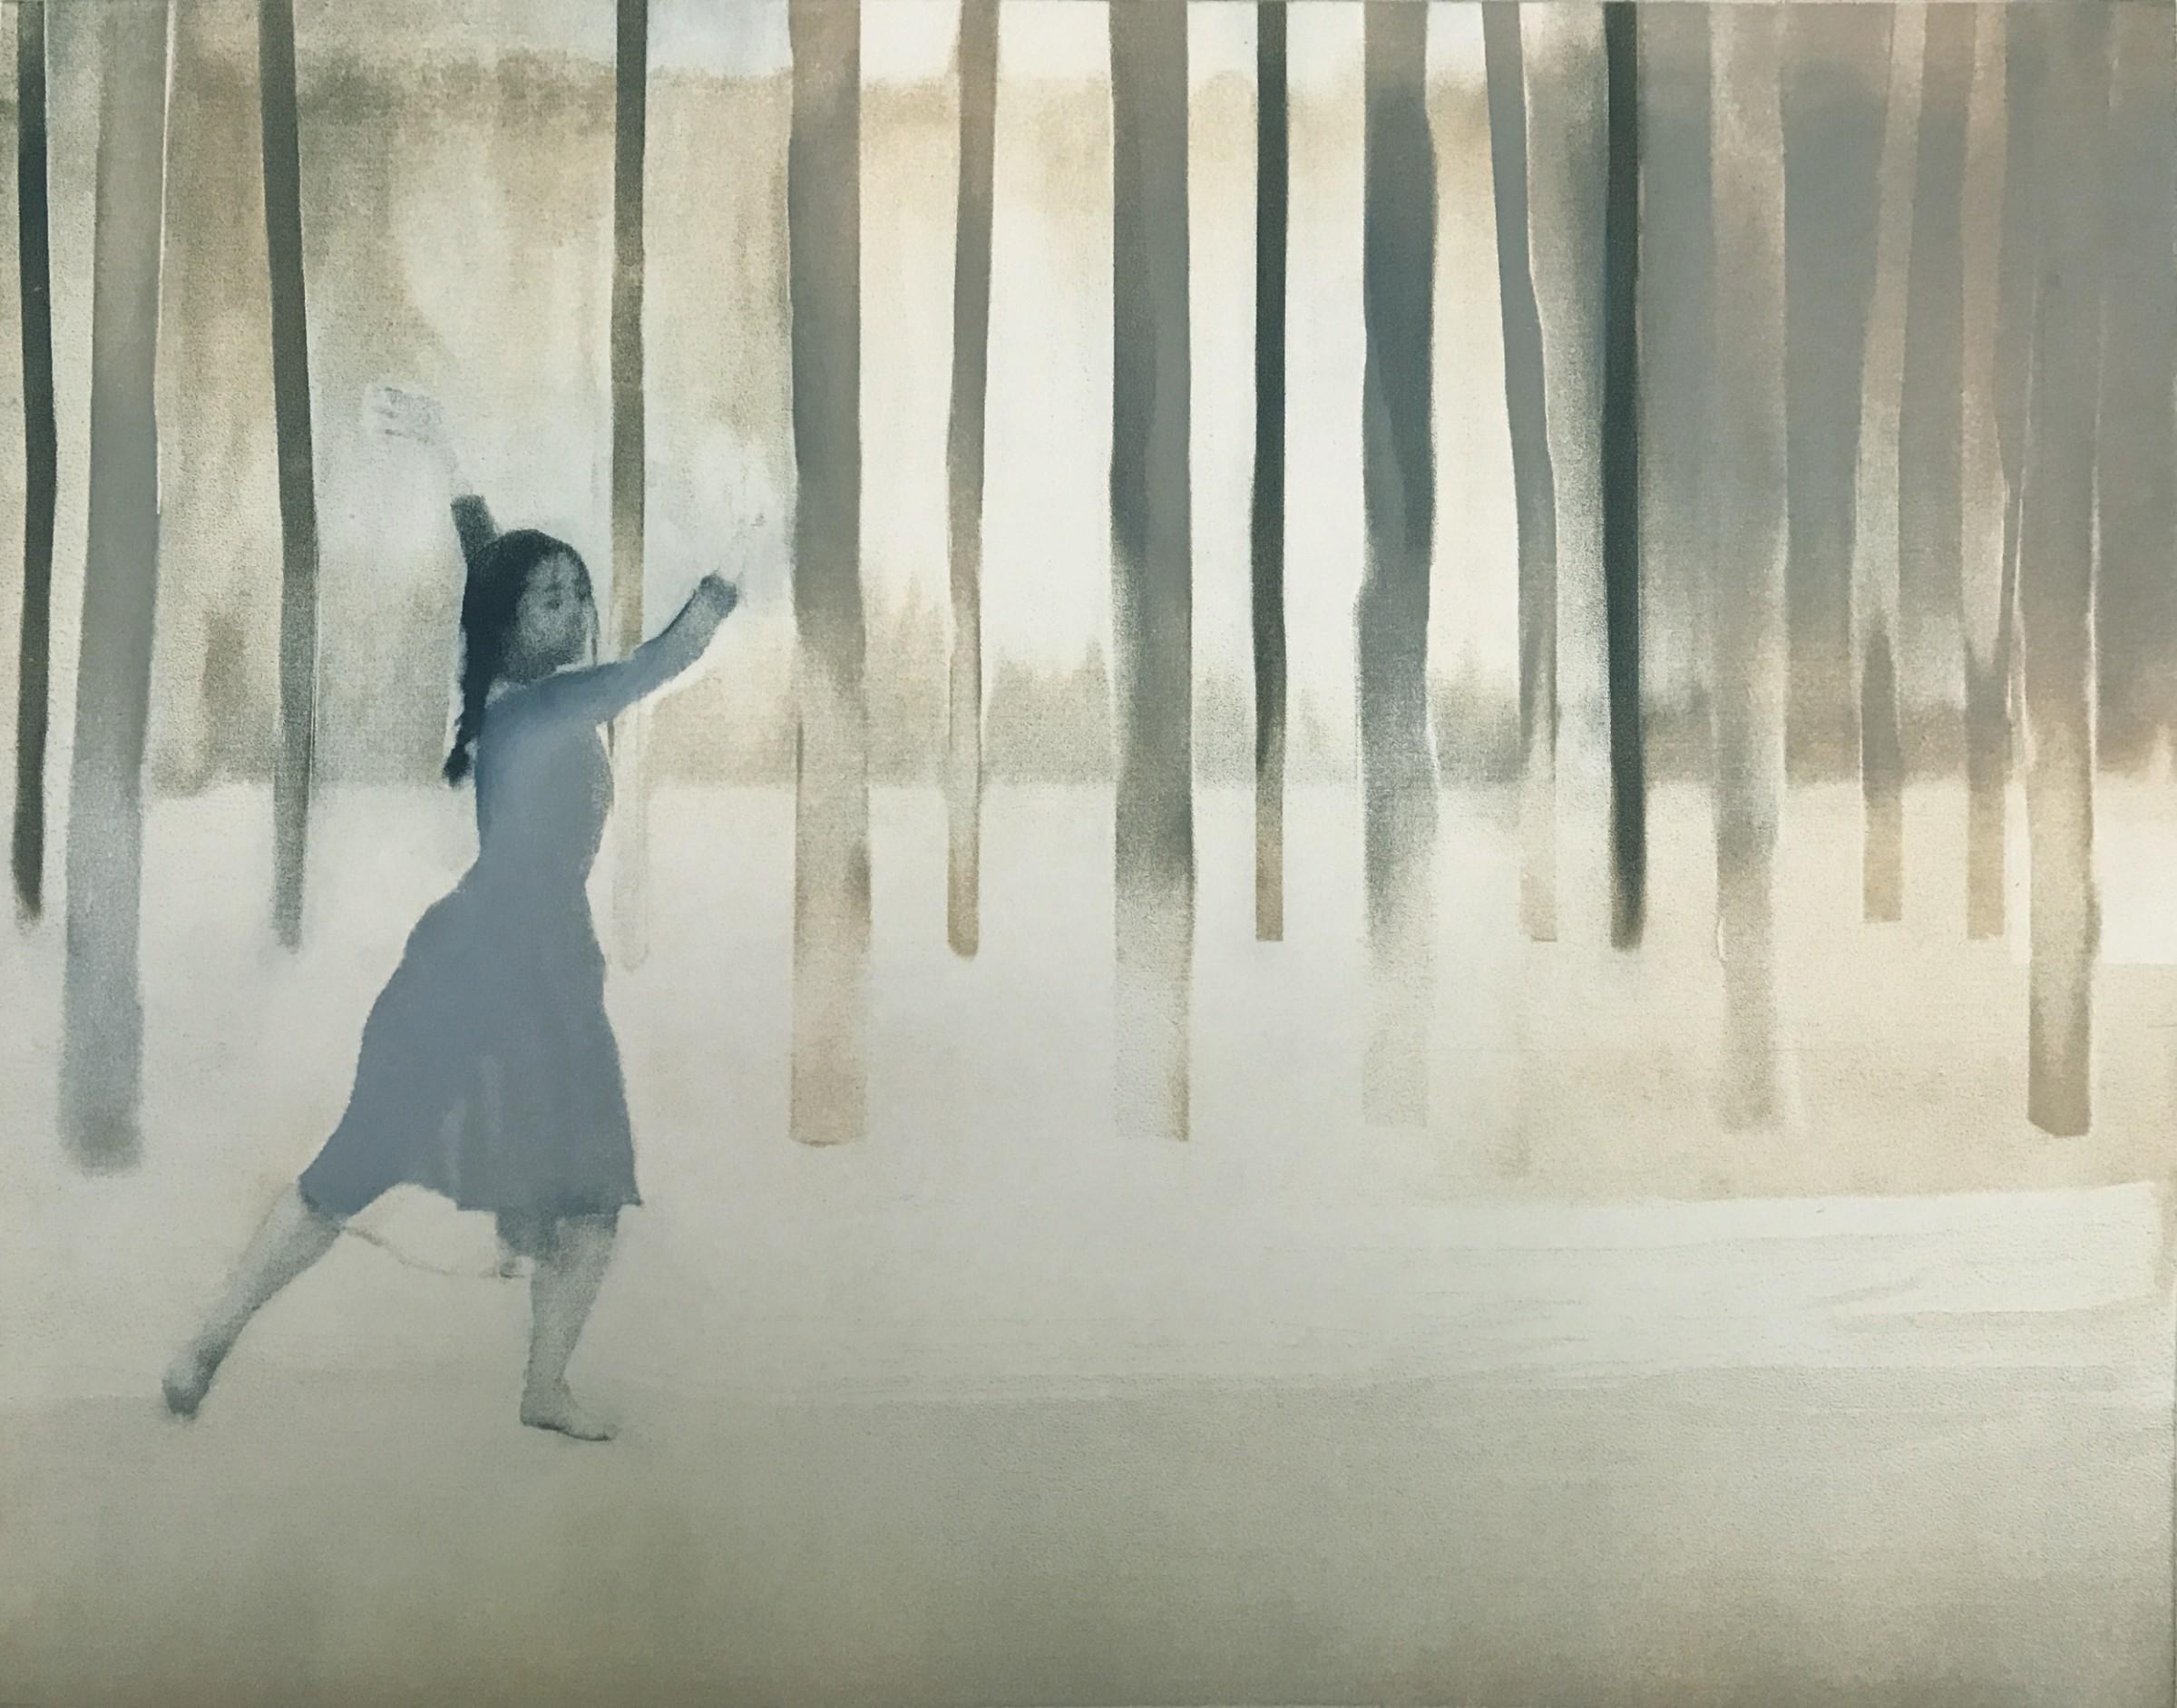 "<span class=""link fancybox-details-link""><a href=""/exhibitions/20/works/artworks_standalone10670/"">View Detail Page</a></span><div class=""artist""><span class=""artist""><strong>Margaret Ashman RE</strong></span></div><div class=""title""><em>Mori (Woods)</em></div><div class=""medium"">photo etching<br></div><div class=""dimensions"">48 x 60 cm image size<br><br></div><div class=""edition_details"">edition of 20</div>"